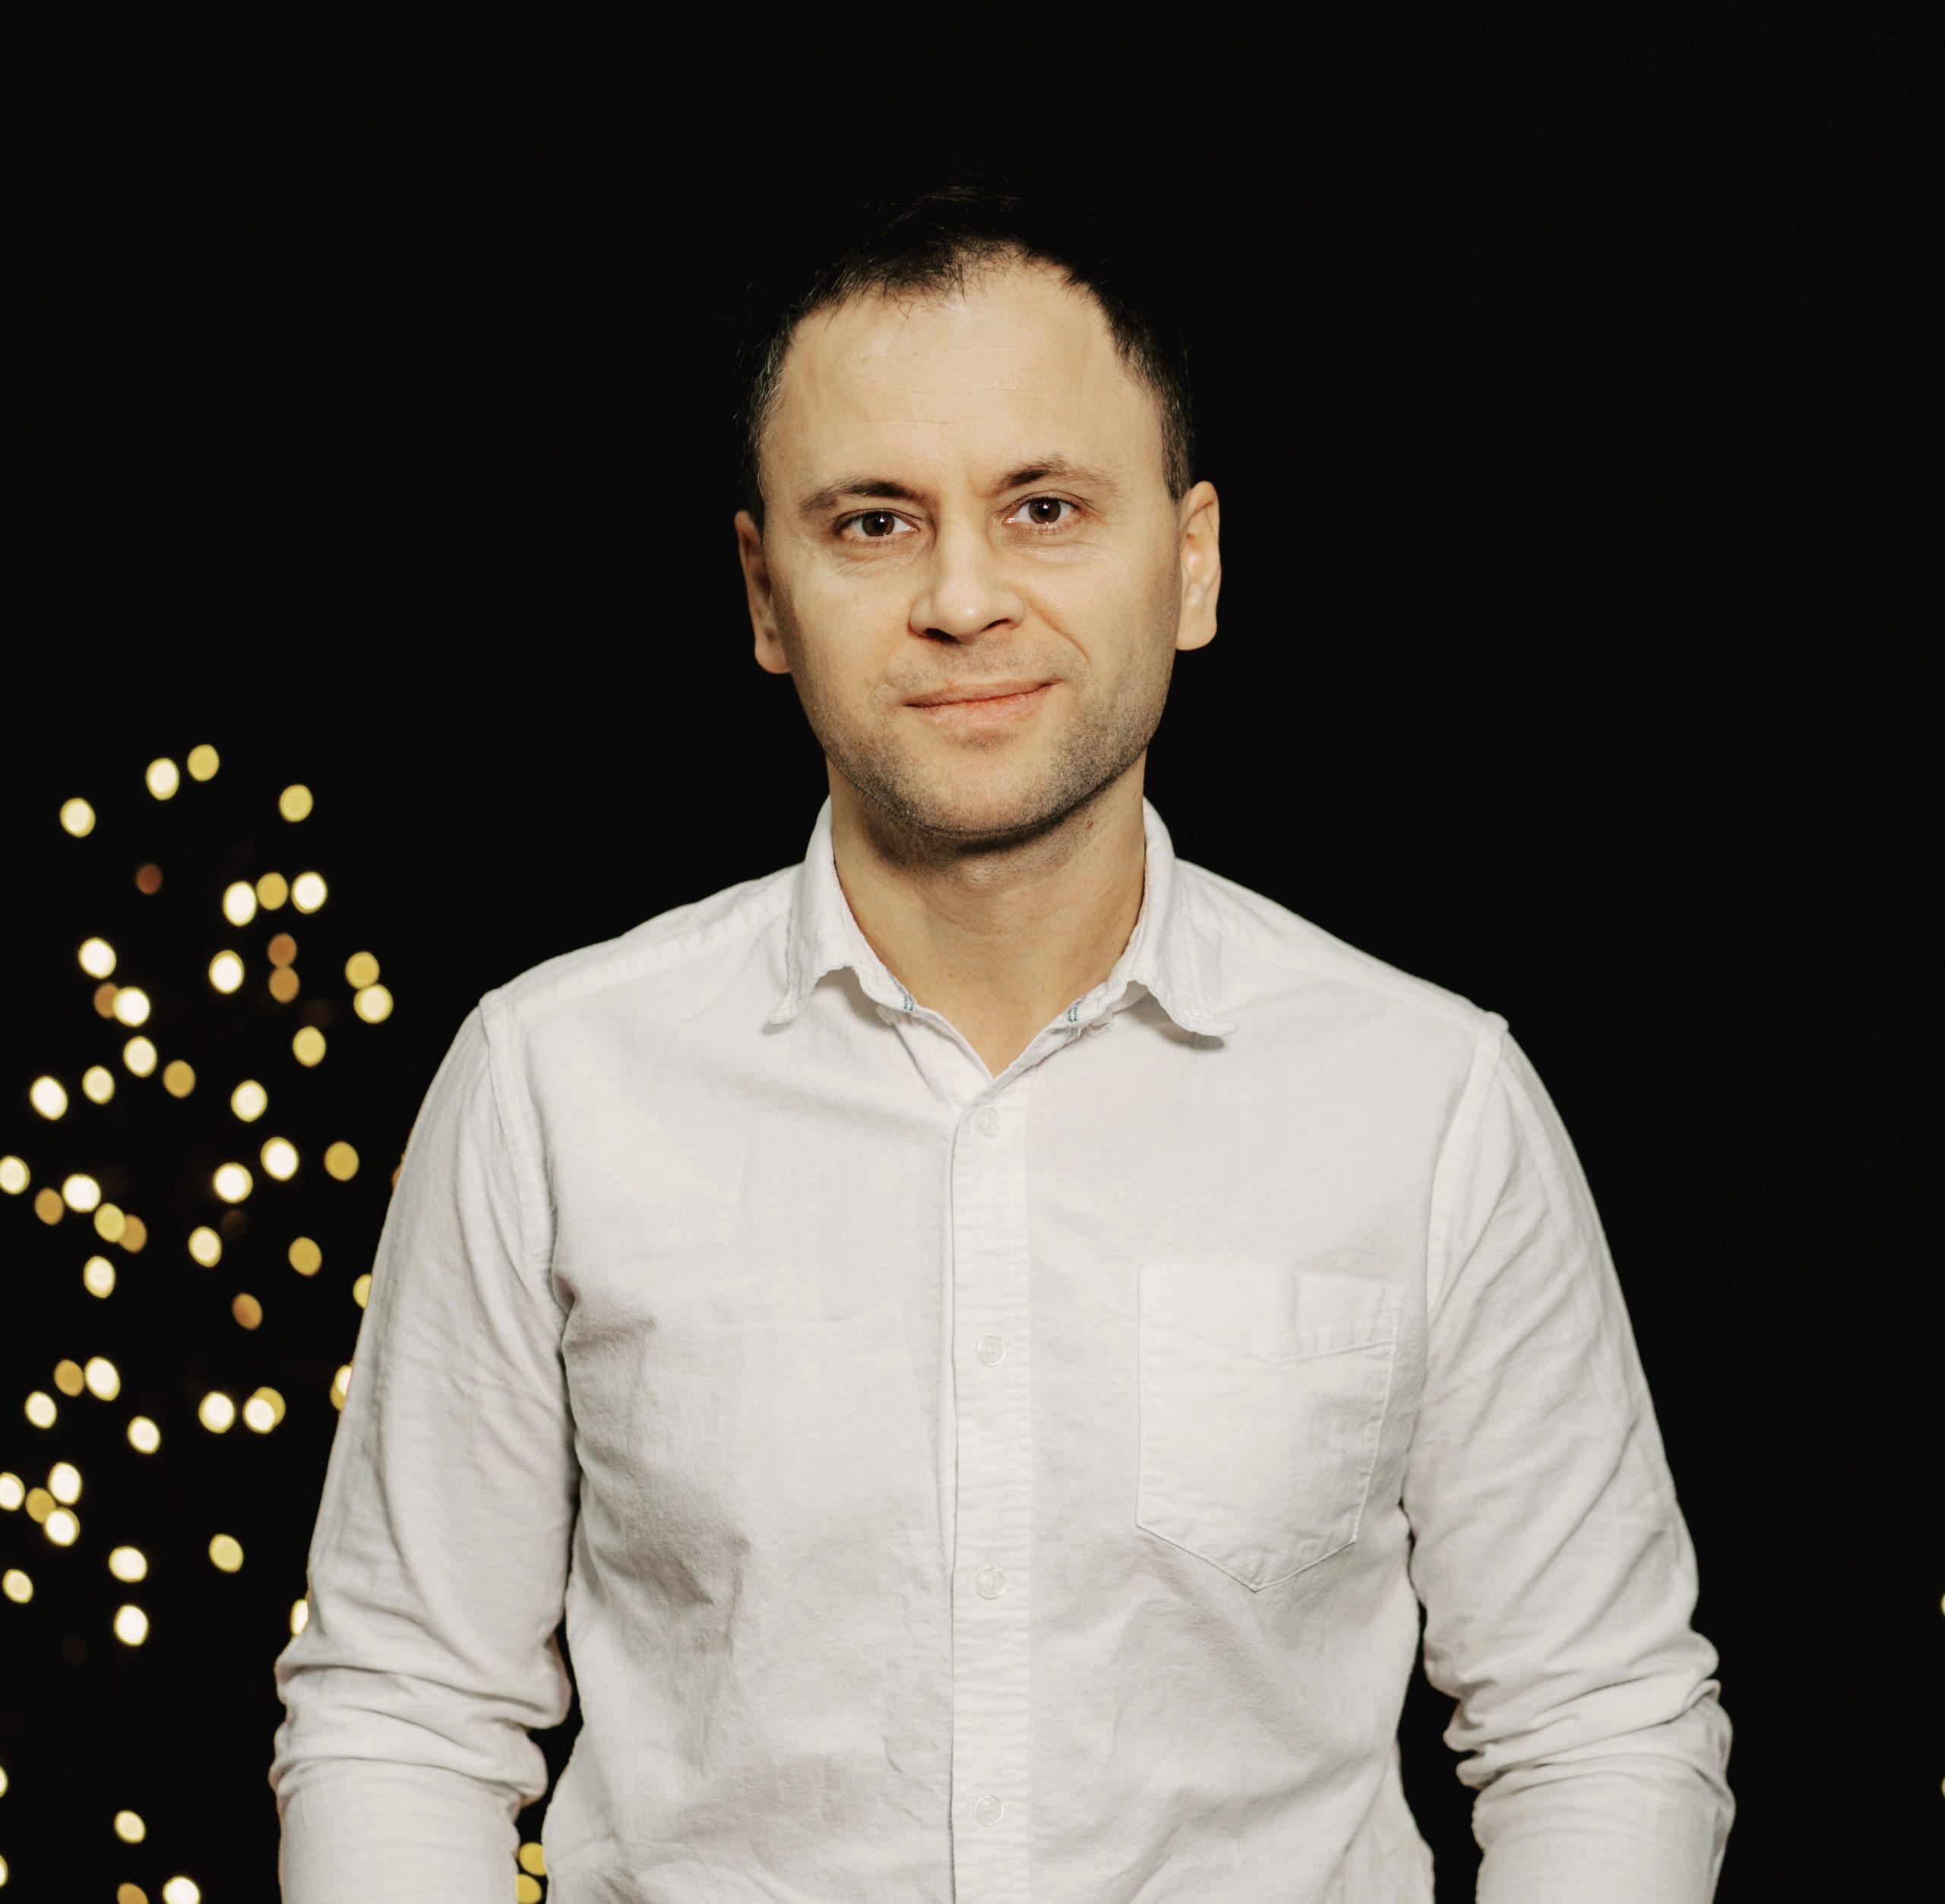 Майбогин Владимир Евгеньевич